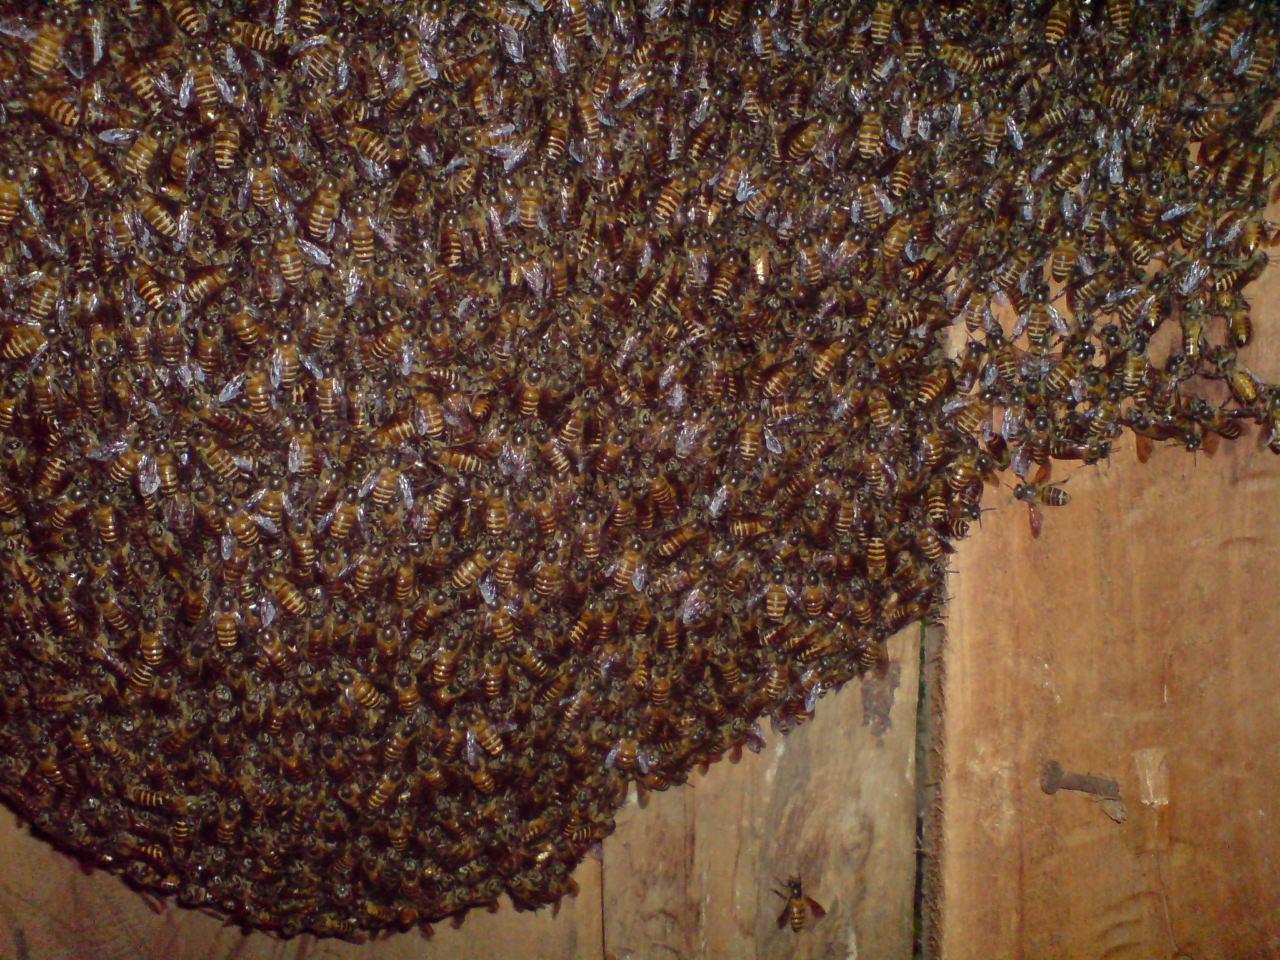 Migrating Honey Bee Kingdom